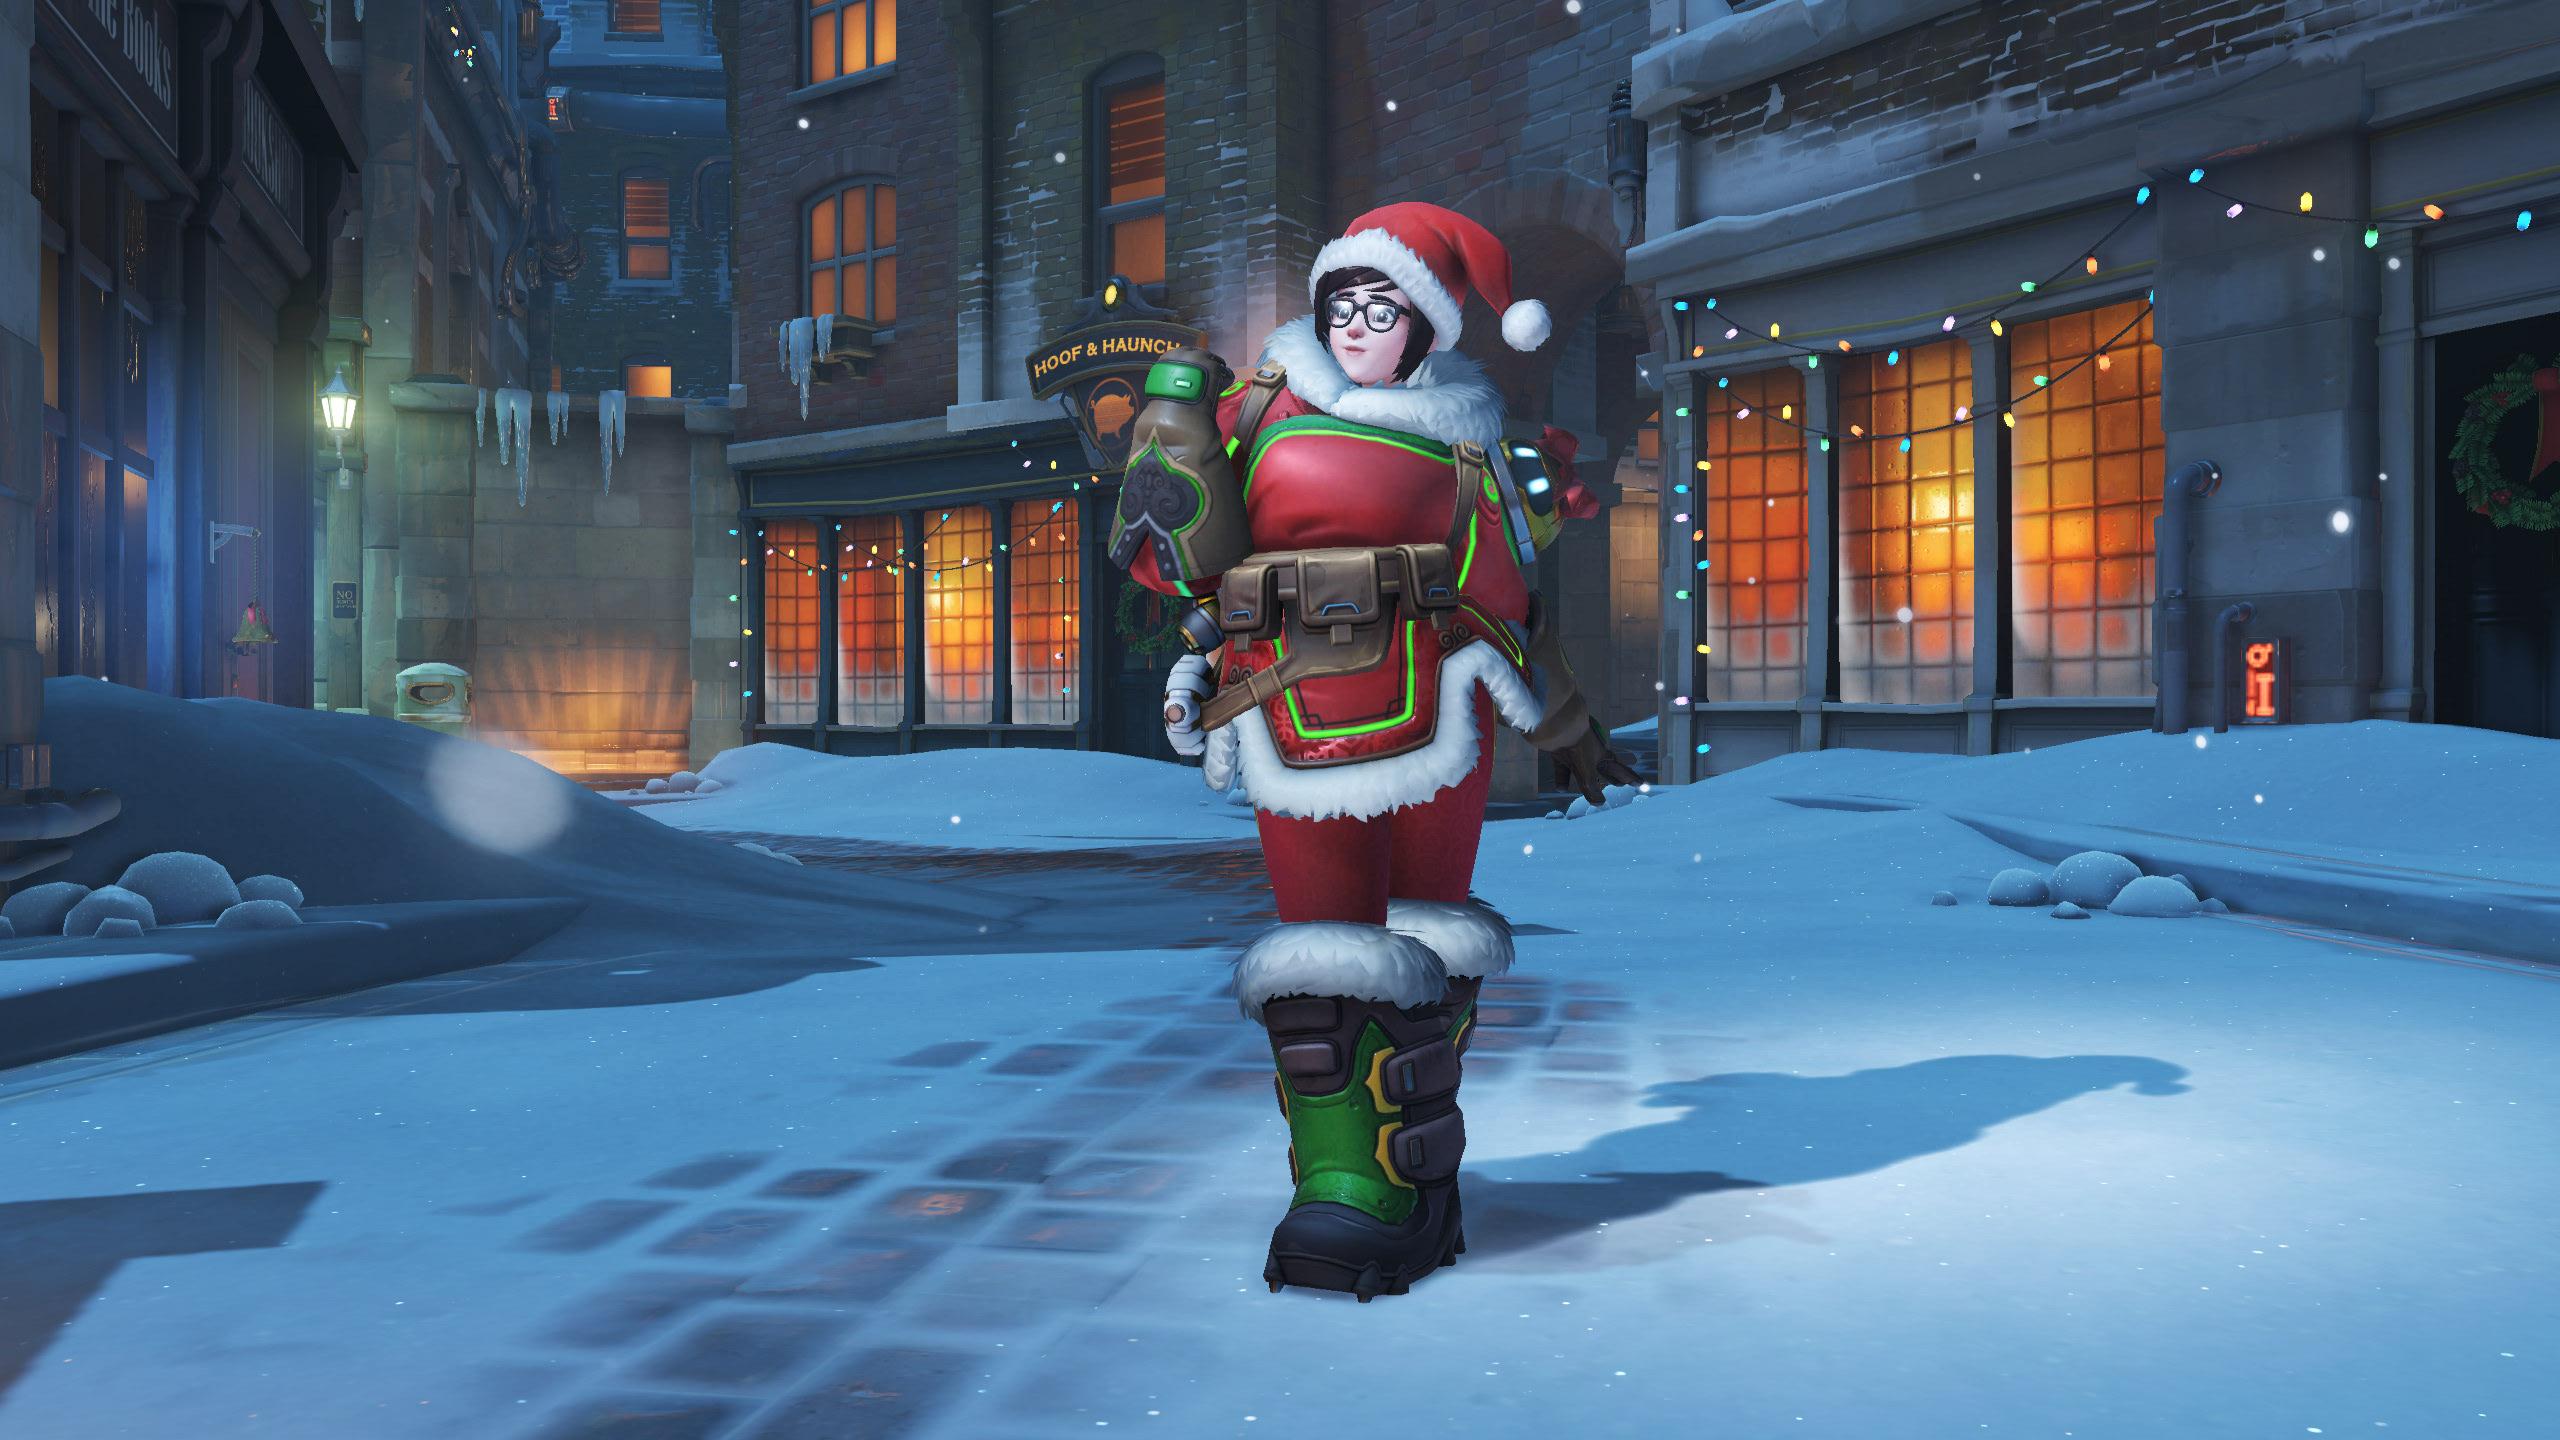 Overwatch Christmas skins revealed: Santa Torbjörn! | PC Gamer